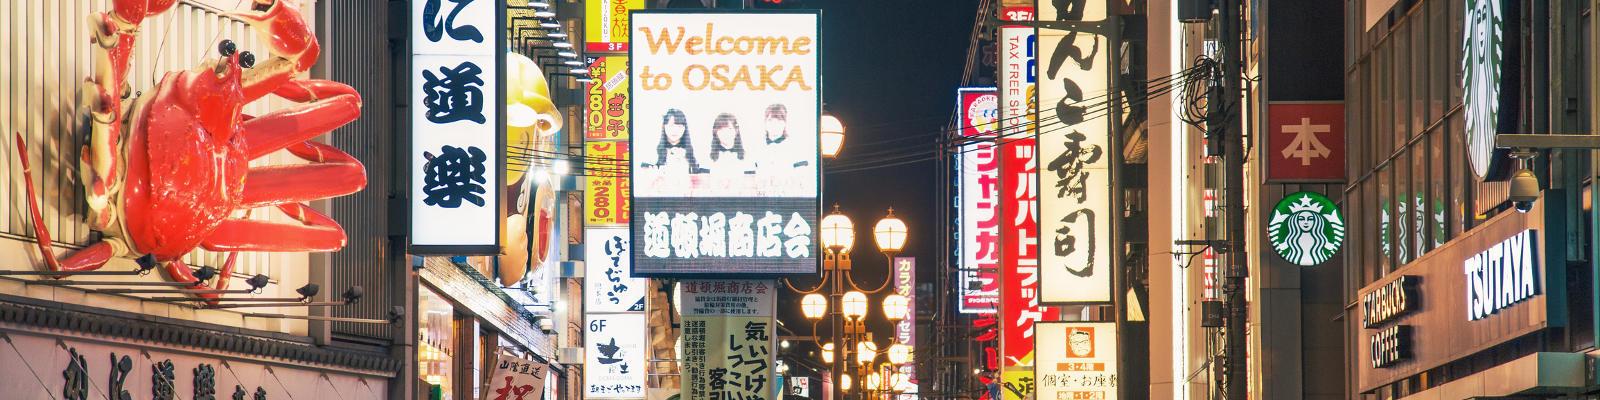 view of street in Osaka Japan